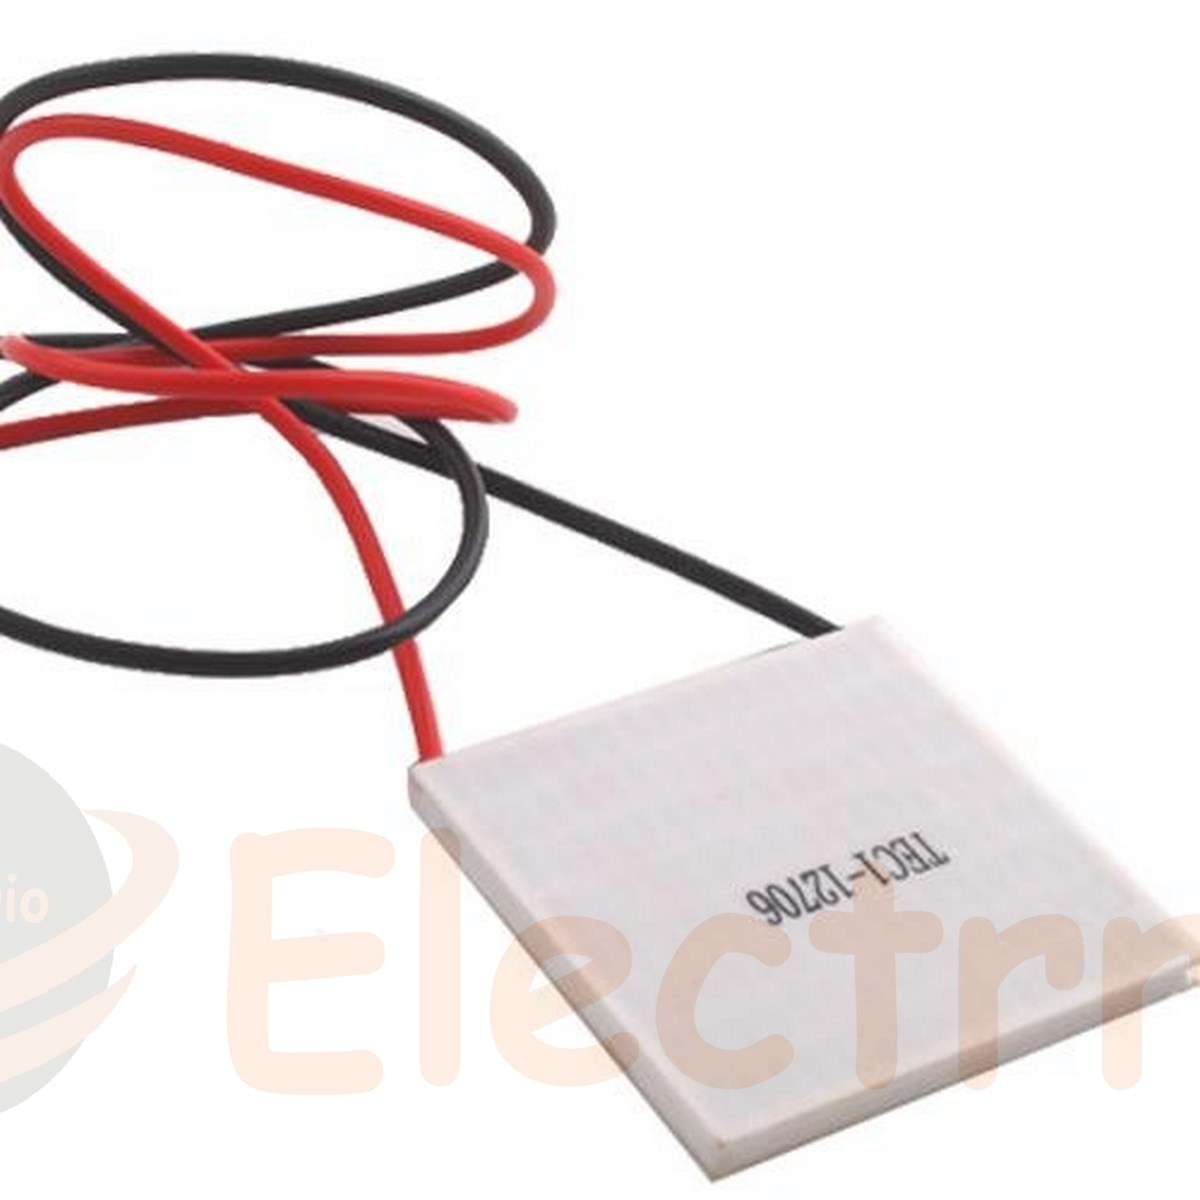 EL2504 PELTIER CELULA TERMOELECTRICA TEC1 12706 12v 60w CERAMICA Cooler